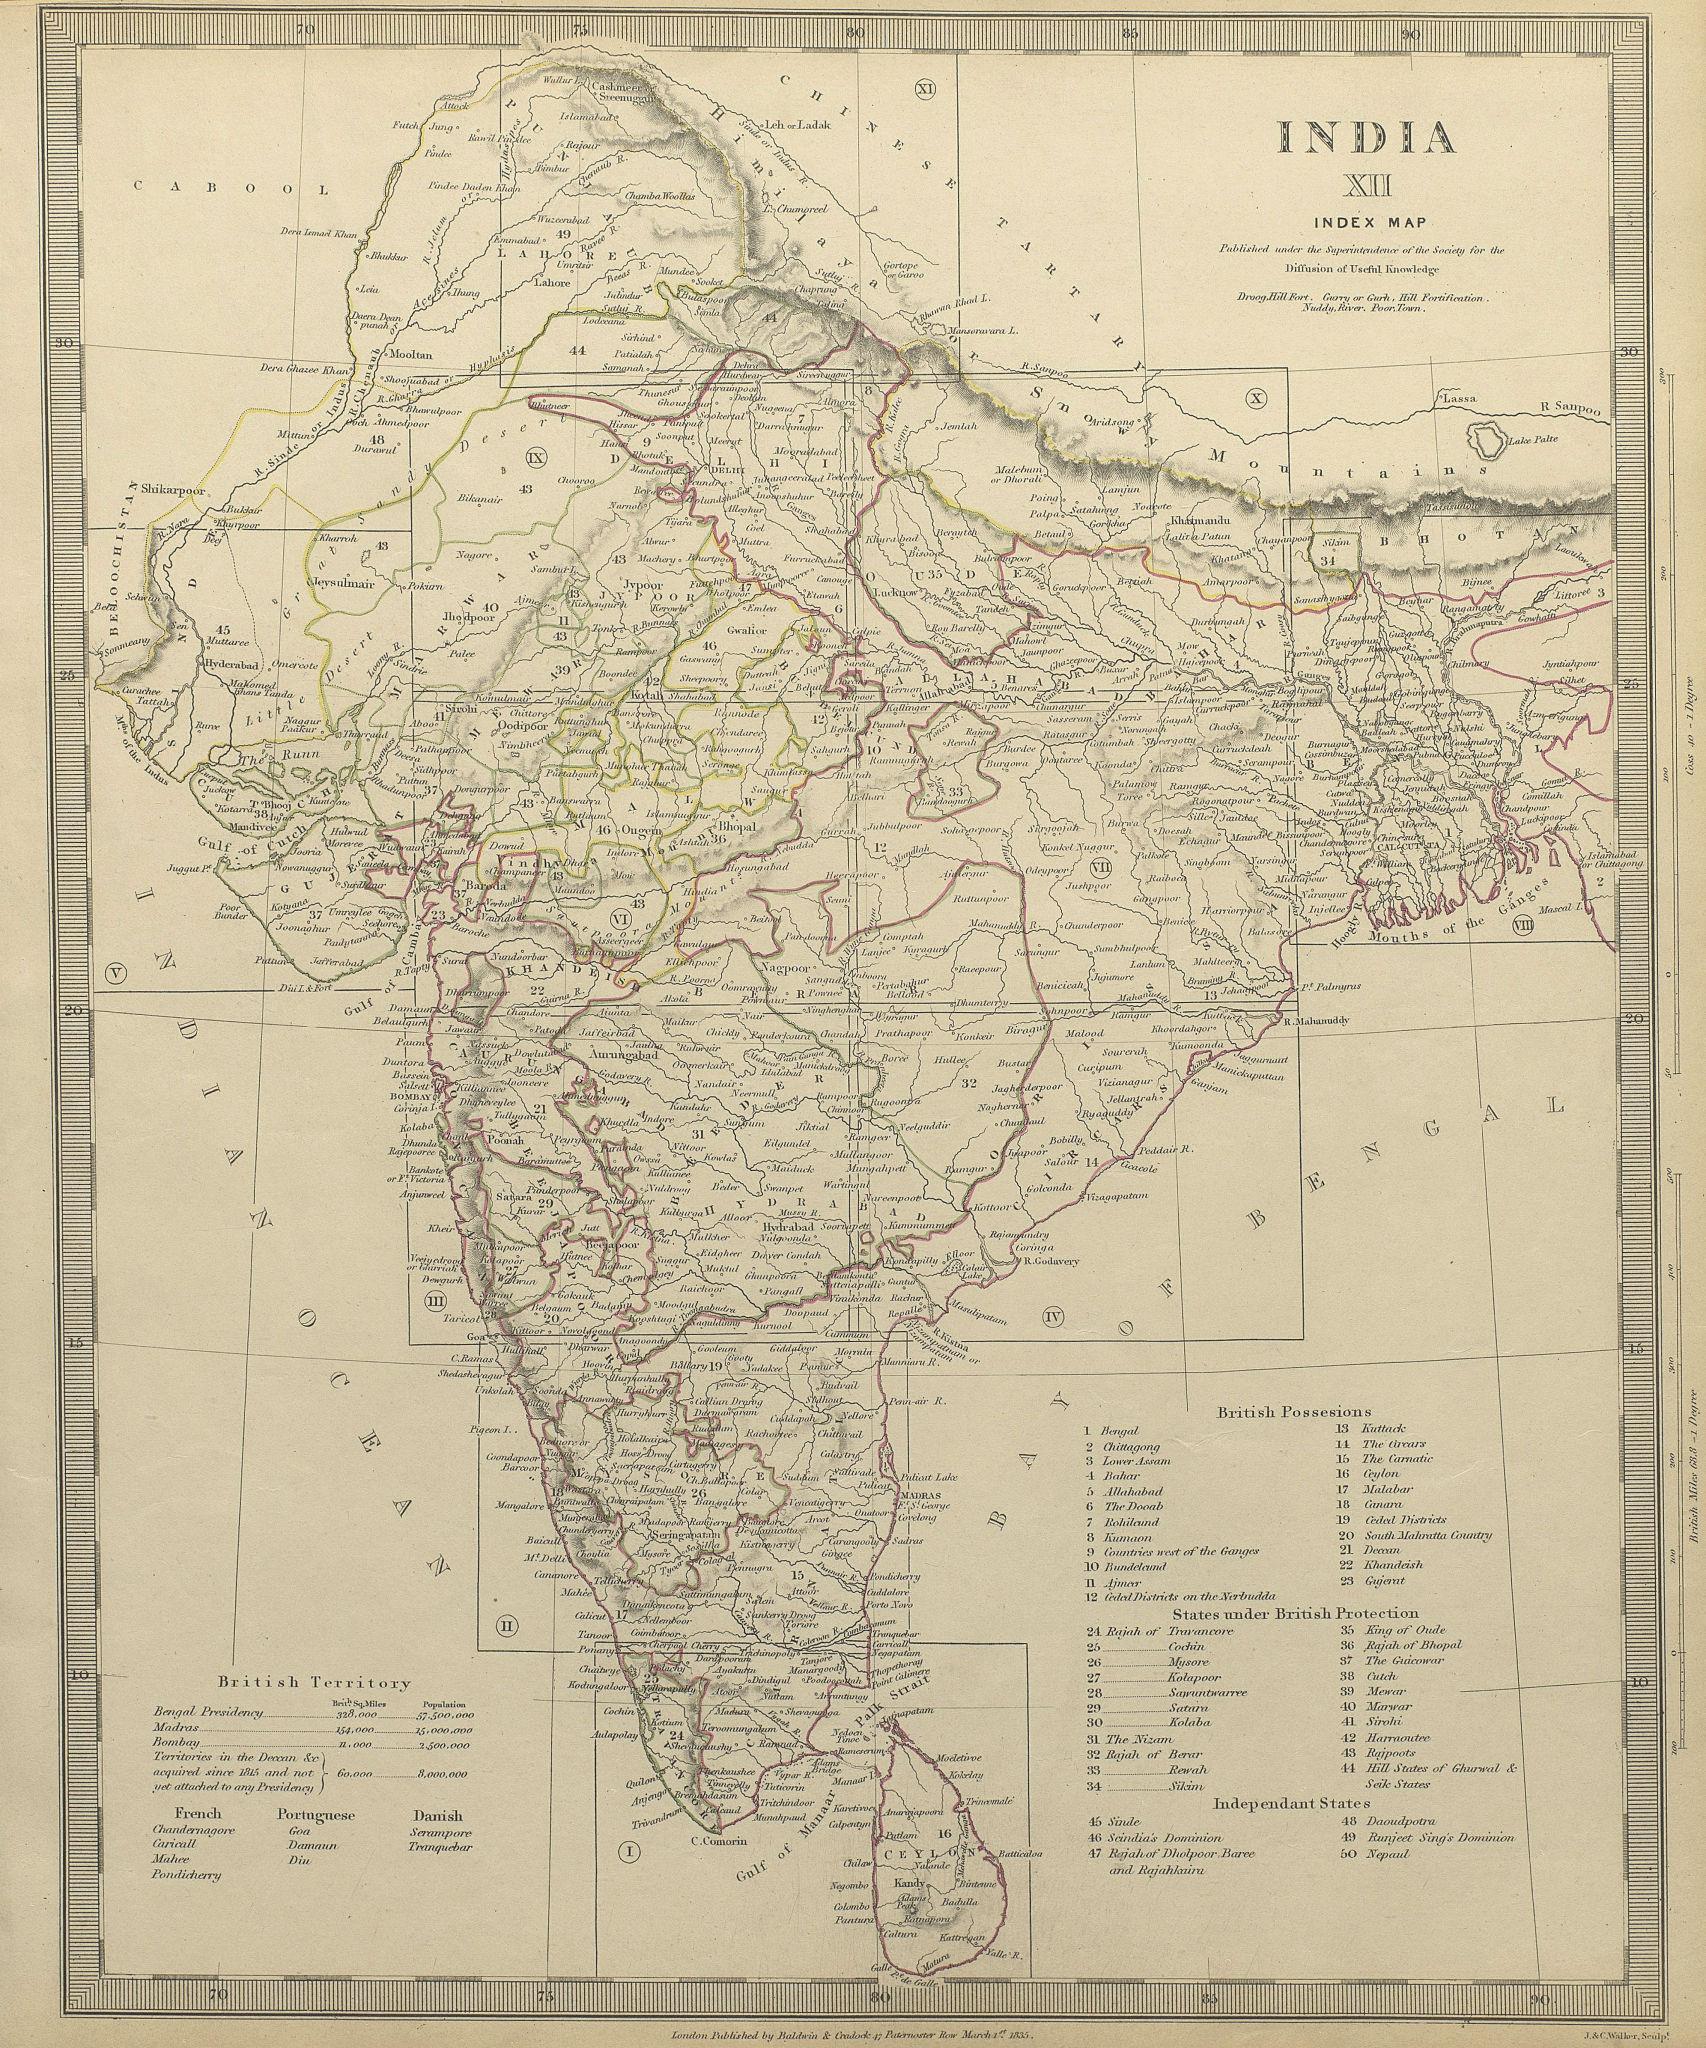 Associate Product INDIA. Index Map. Lists British French Portuguese Danish states. SDUK 1844